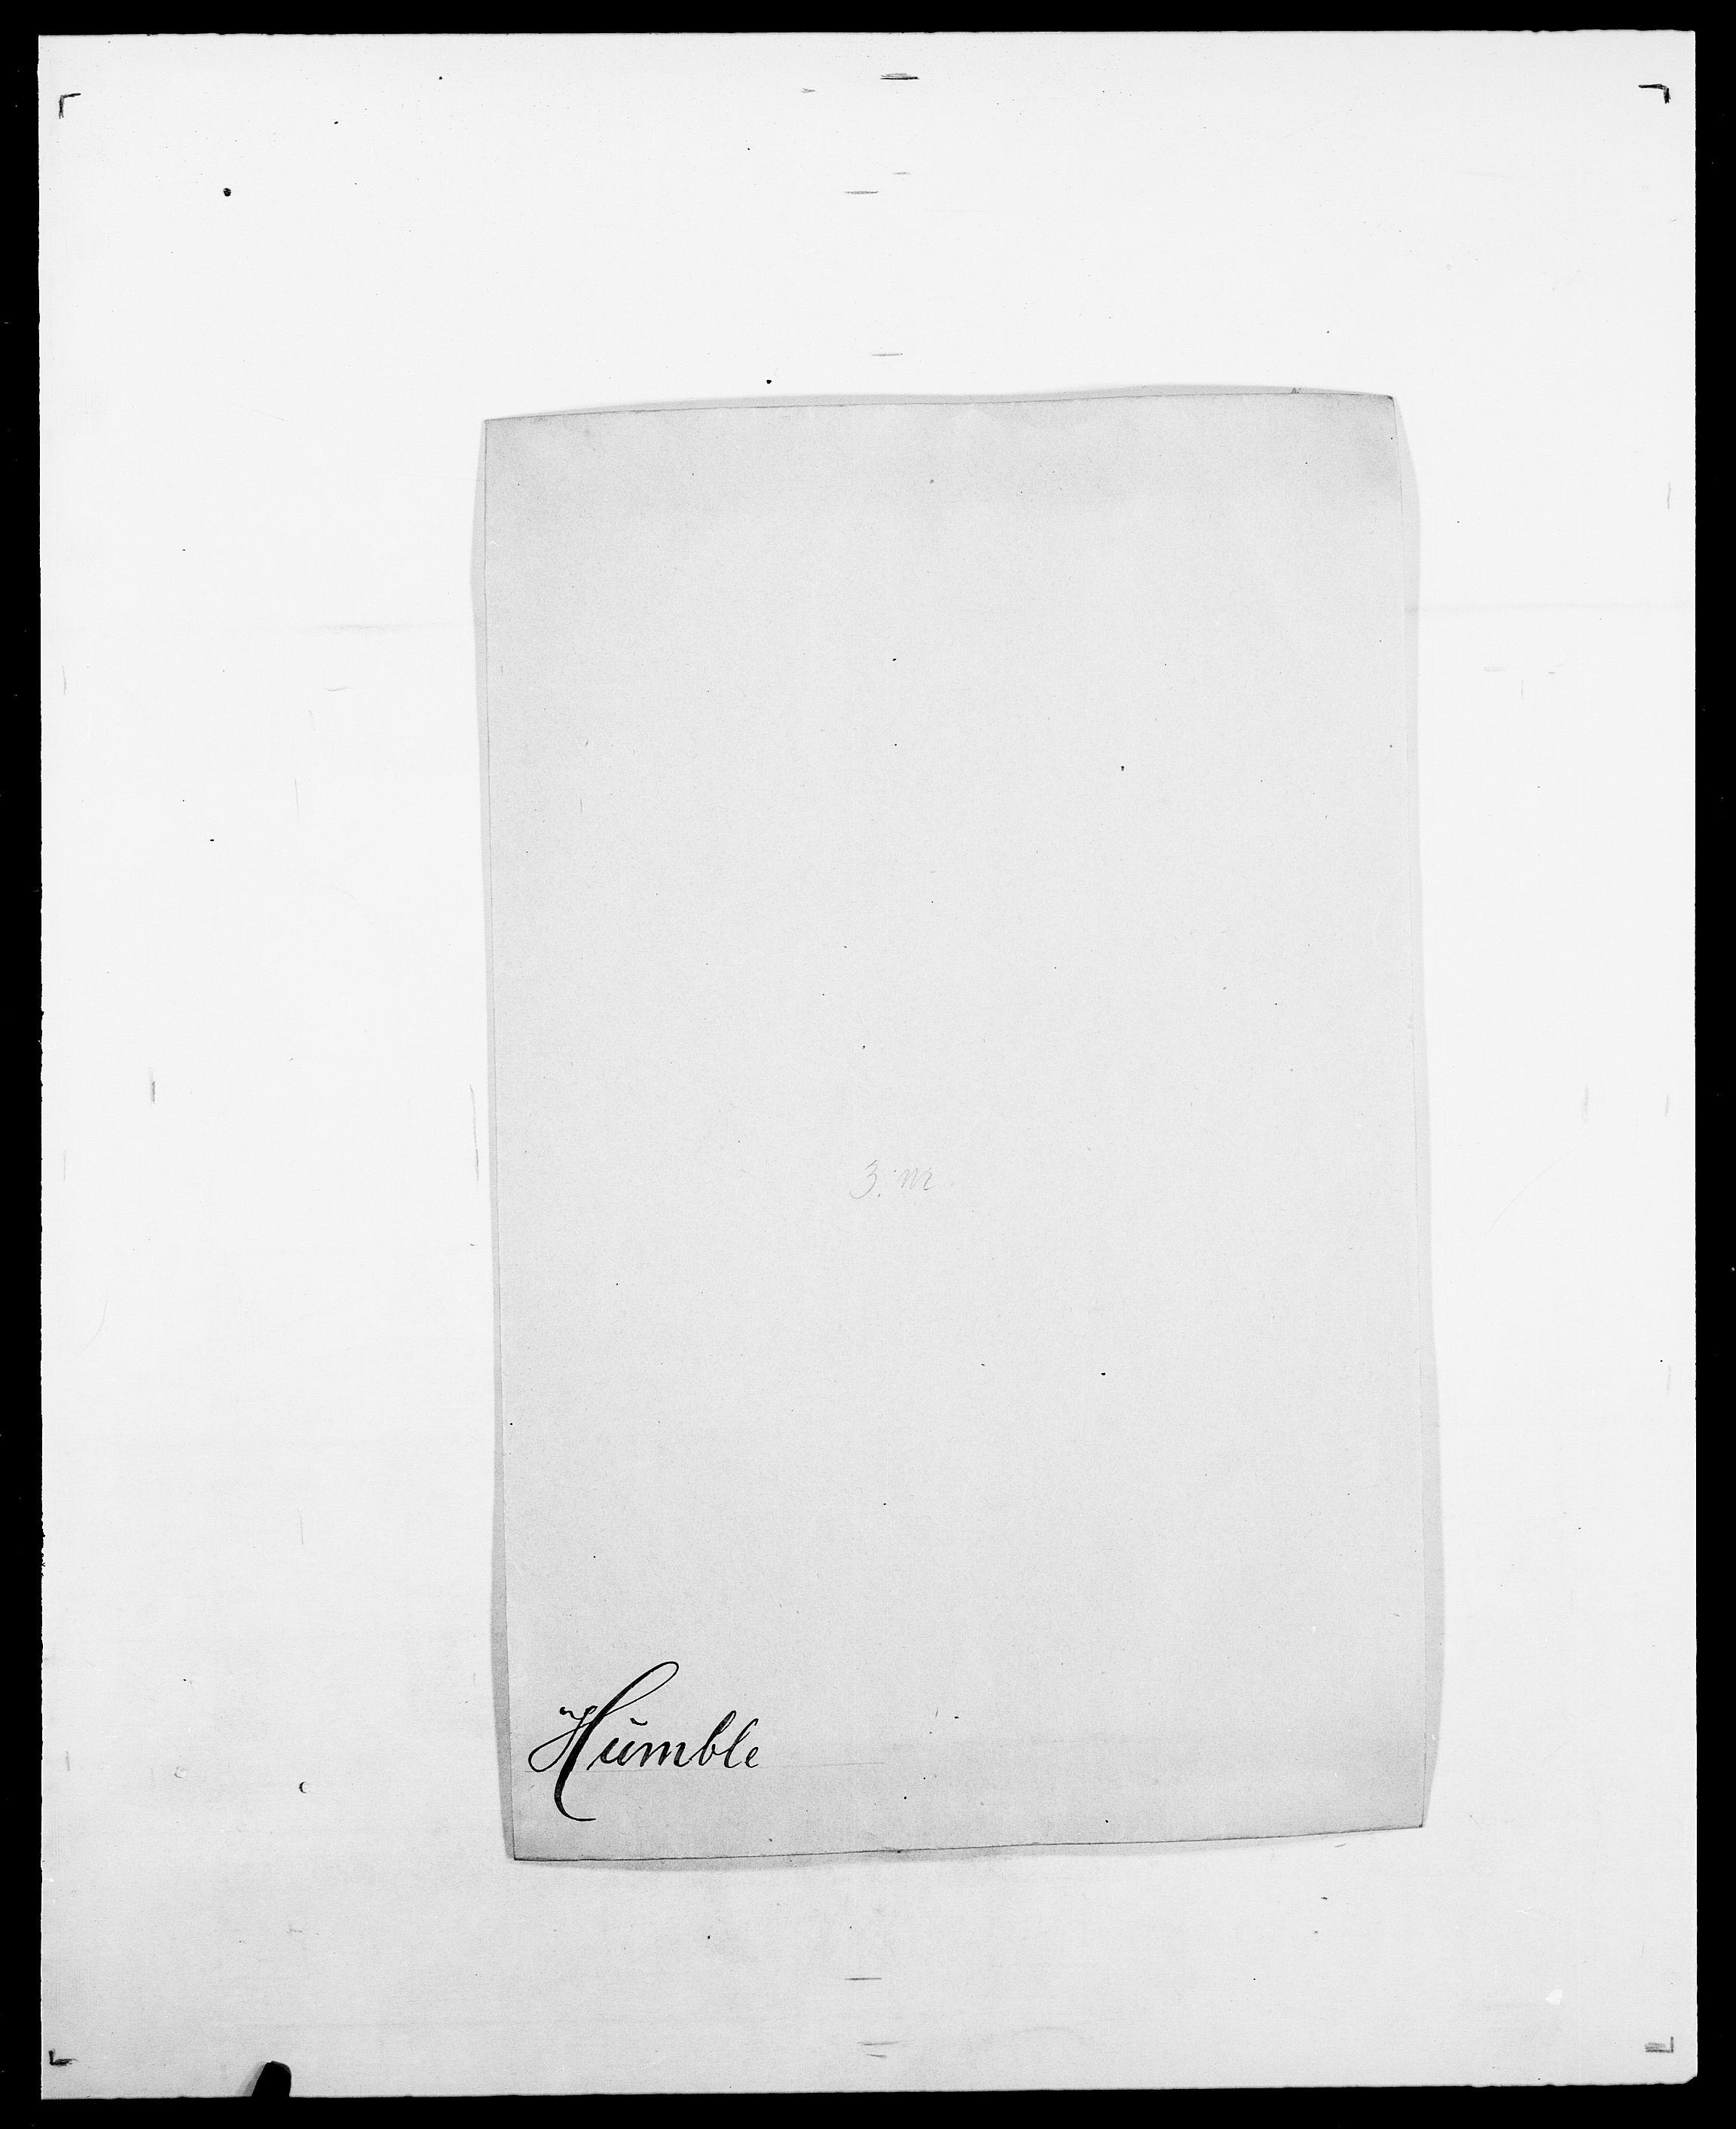 SAO, Delgobe, Charles Antoine - samling, D/Da/L0019: van der Hude - Joys, s. 48